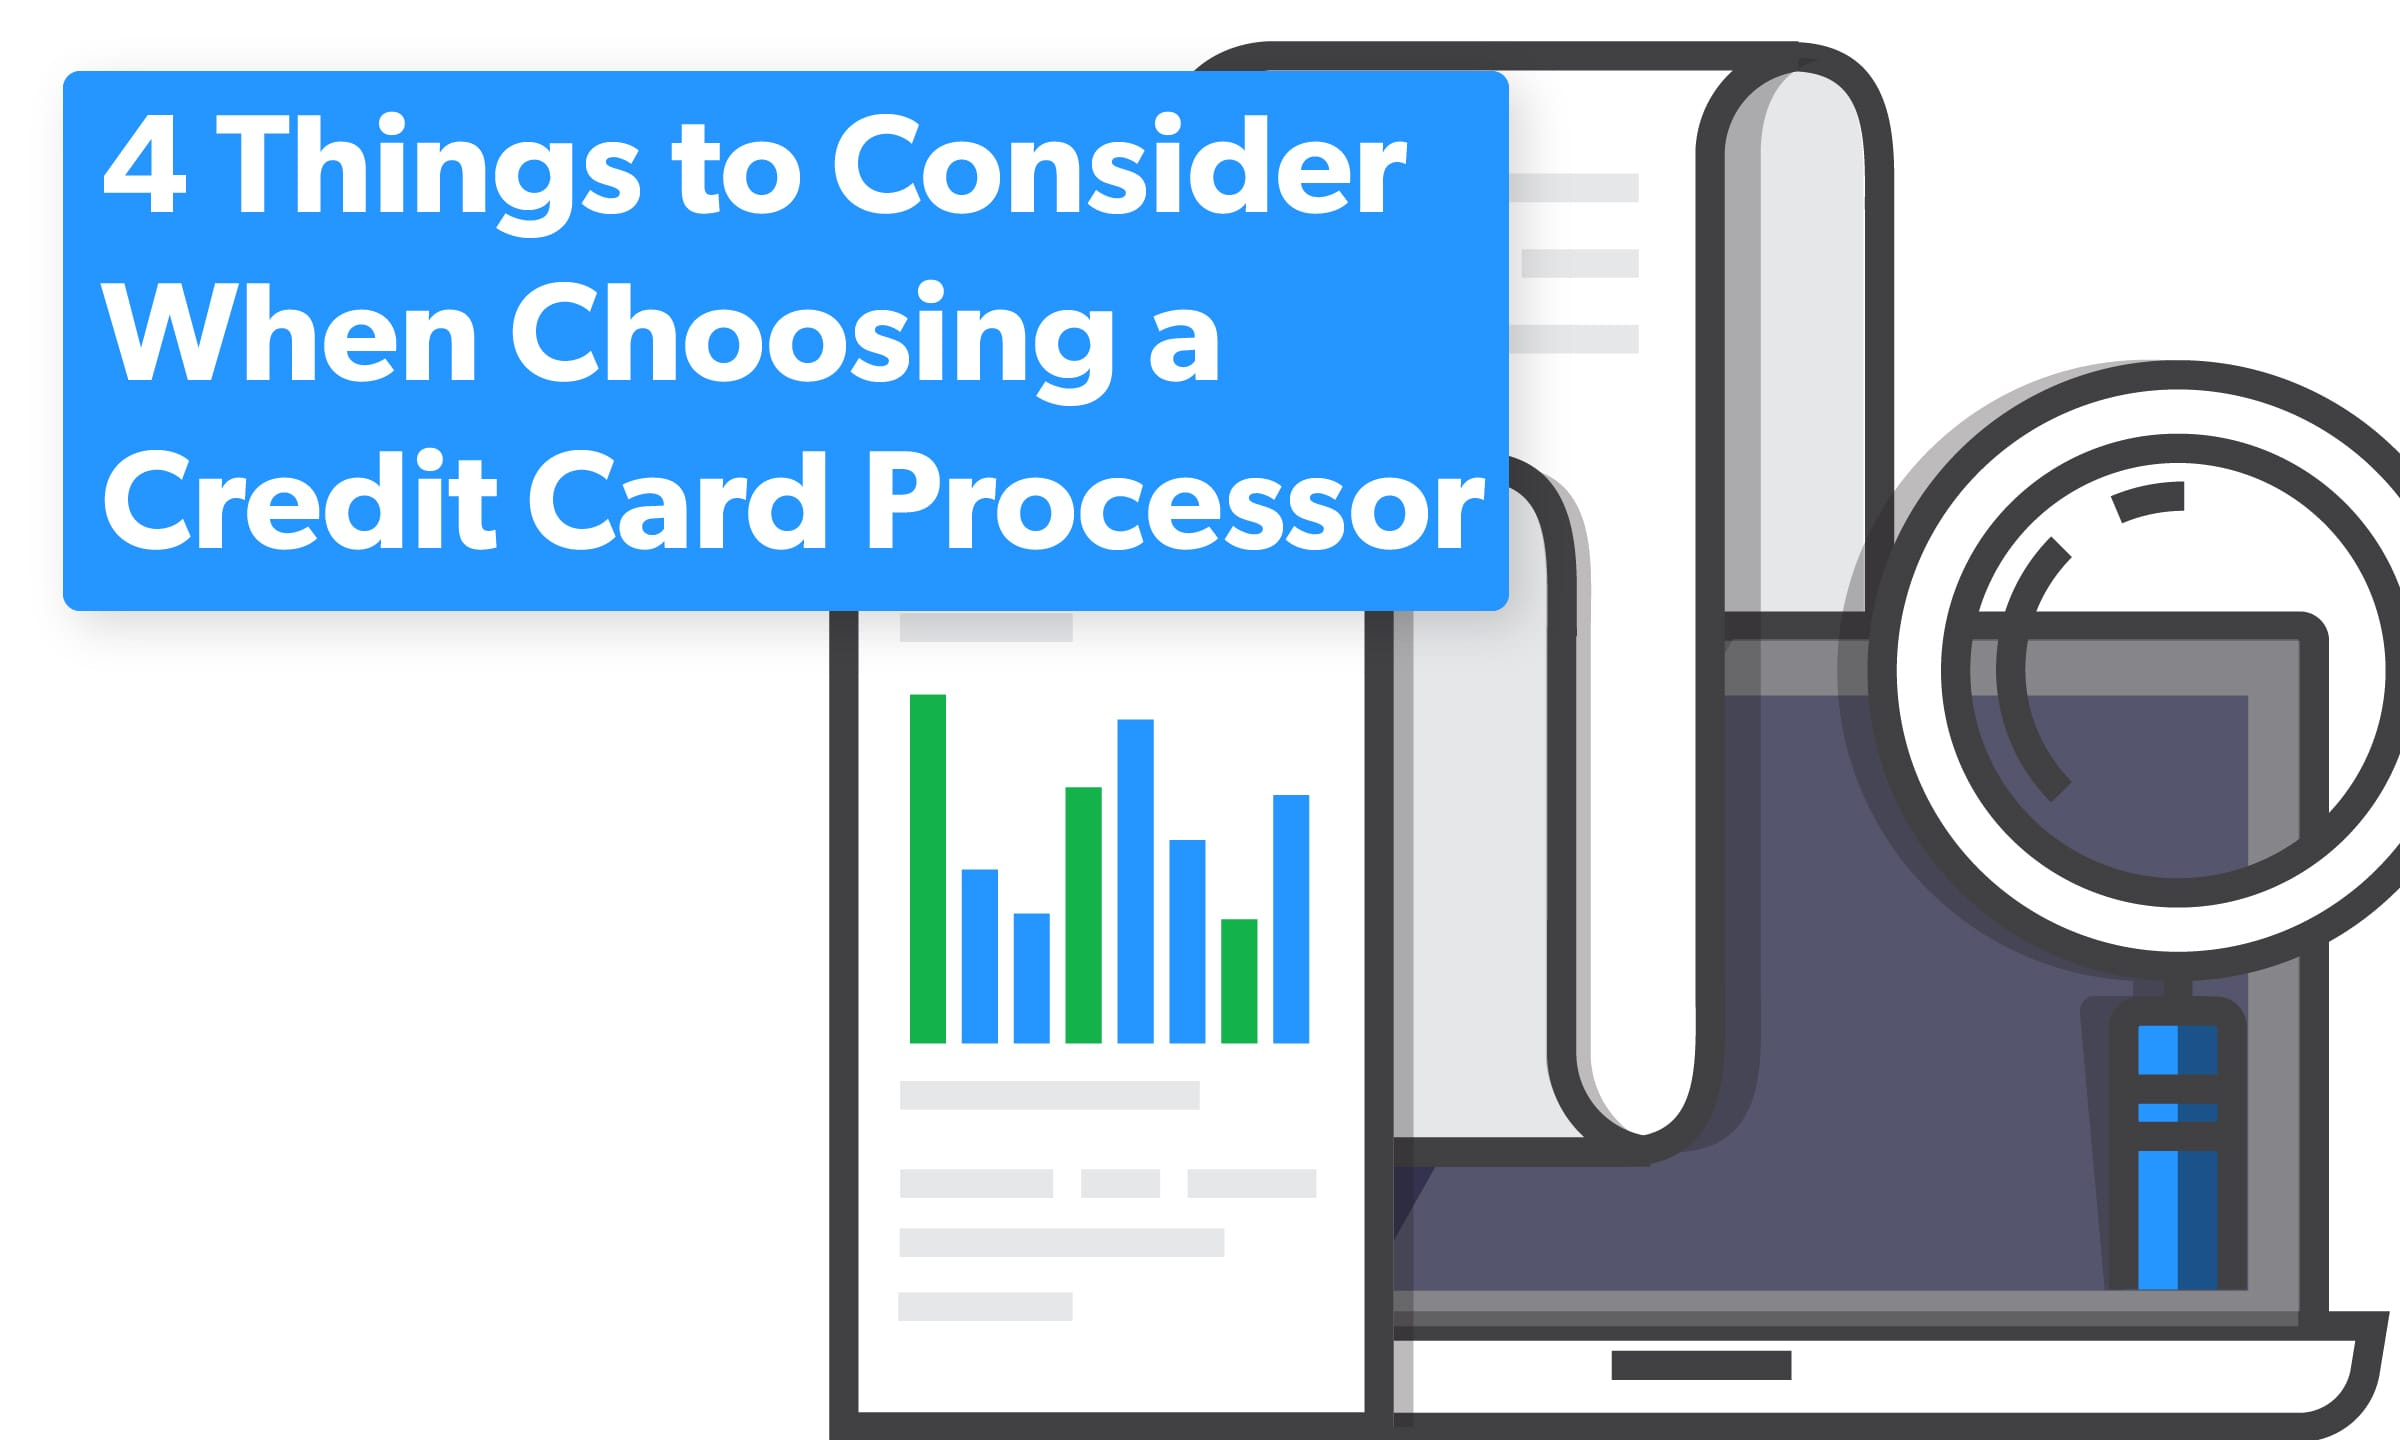 Choosing a Credit Card Processor